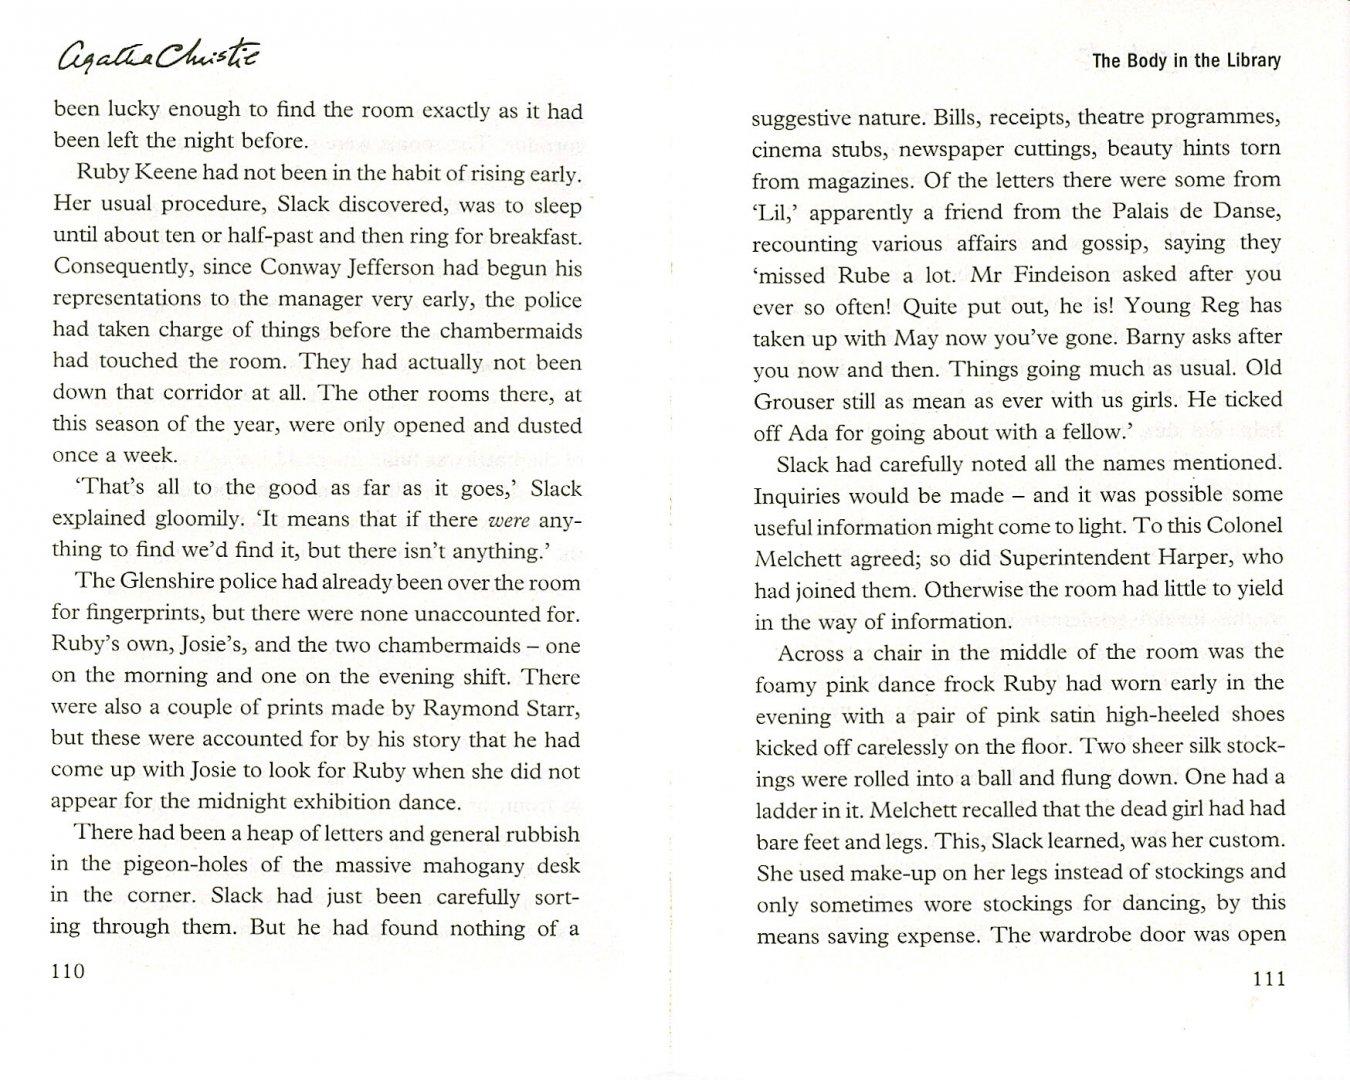 Иллюстрация 1 из 5 для The Body in the Library - Agatha Christie | Лабиринт - книги. Источник: Лабиринт